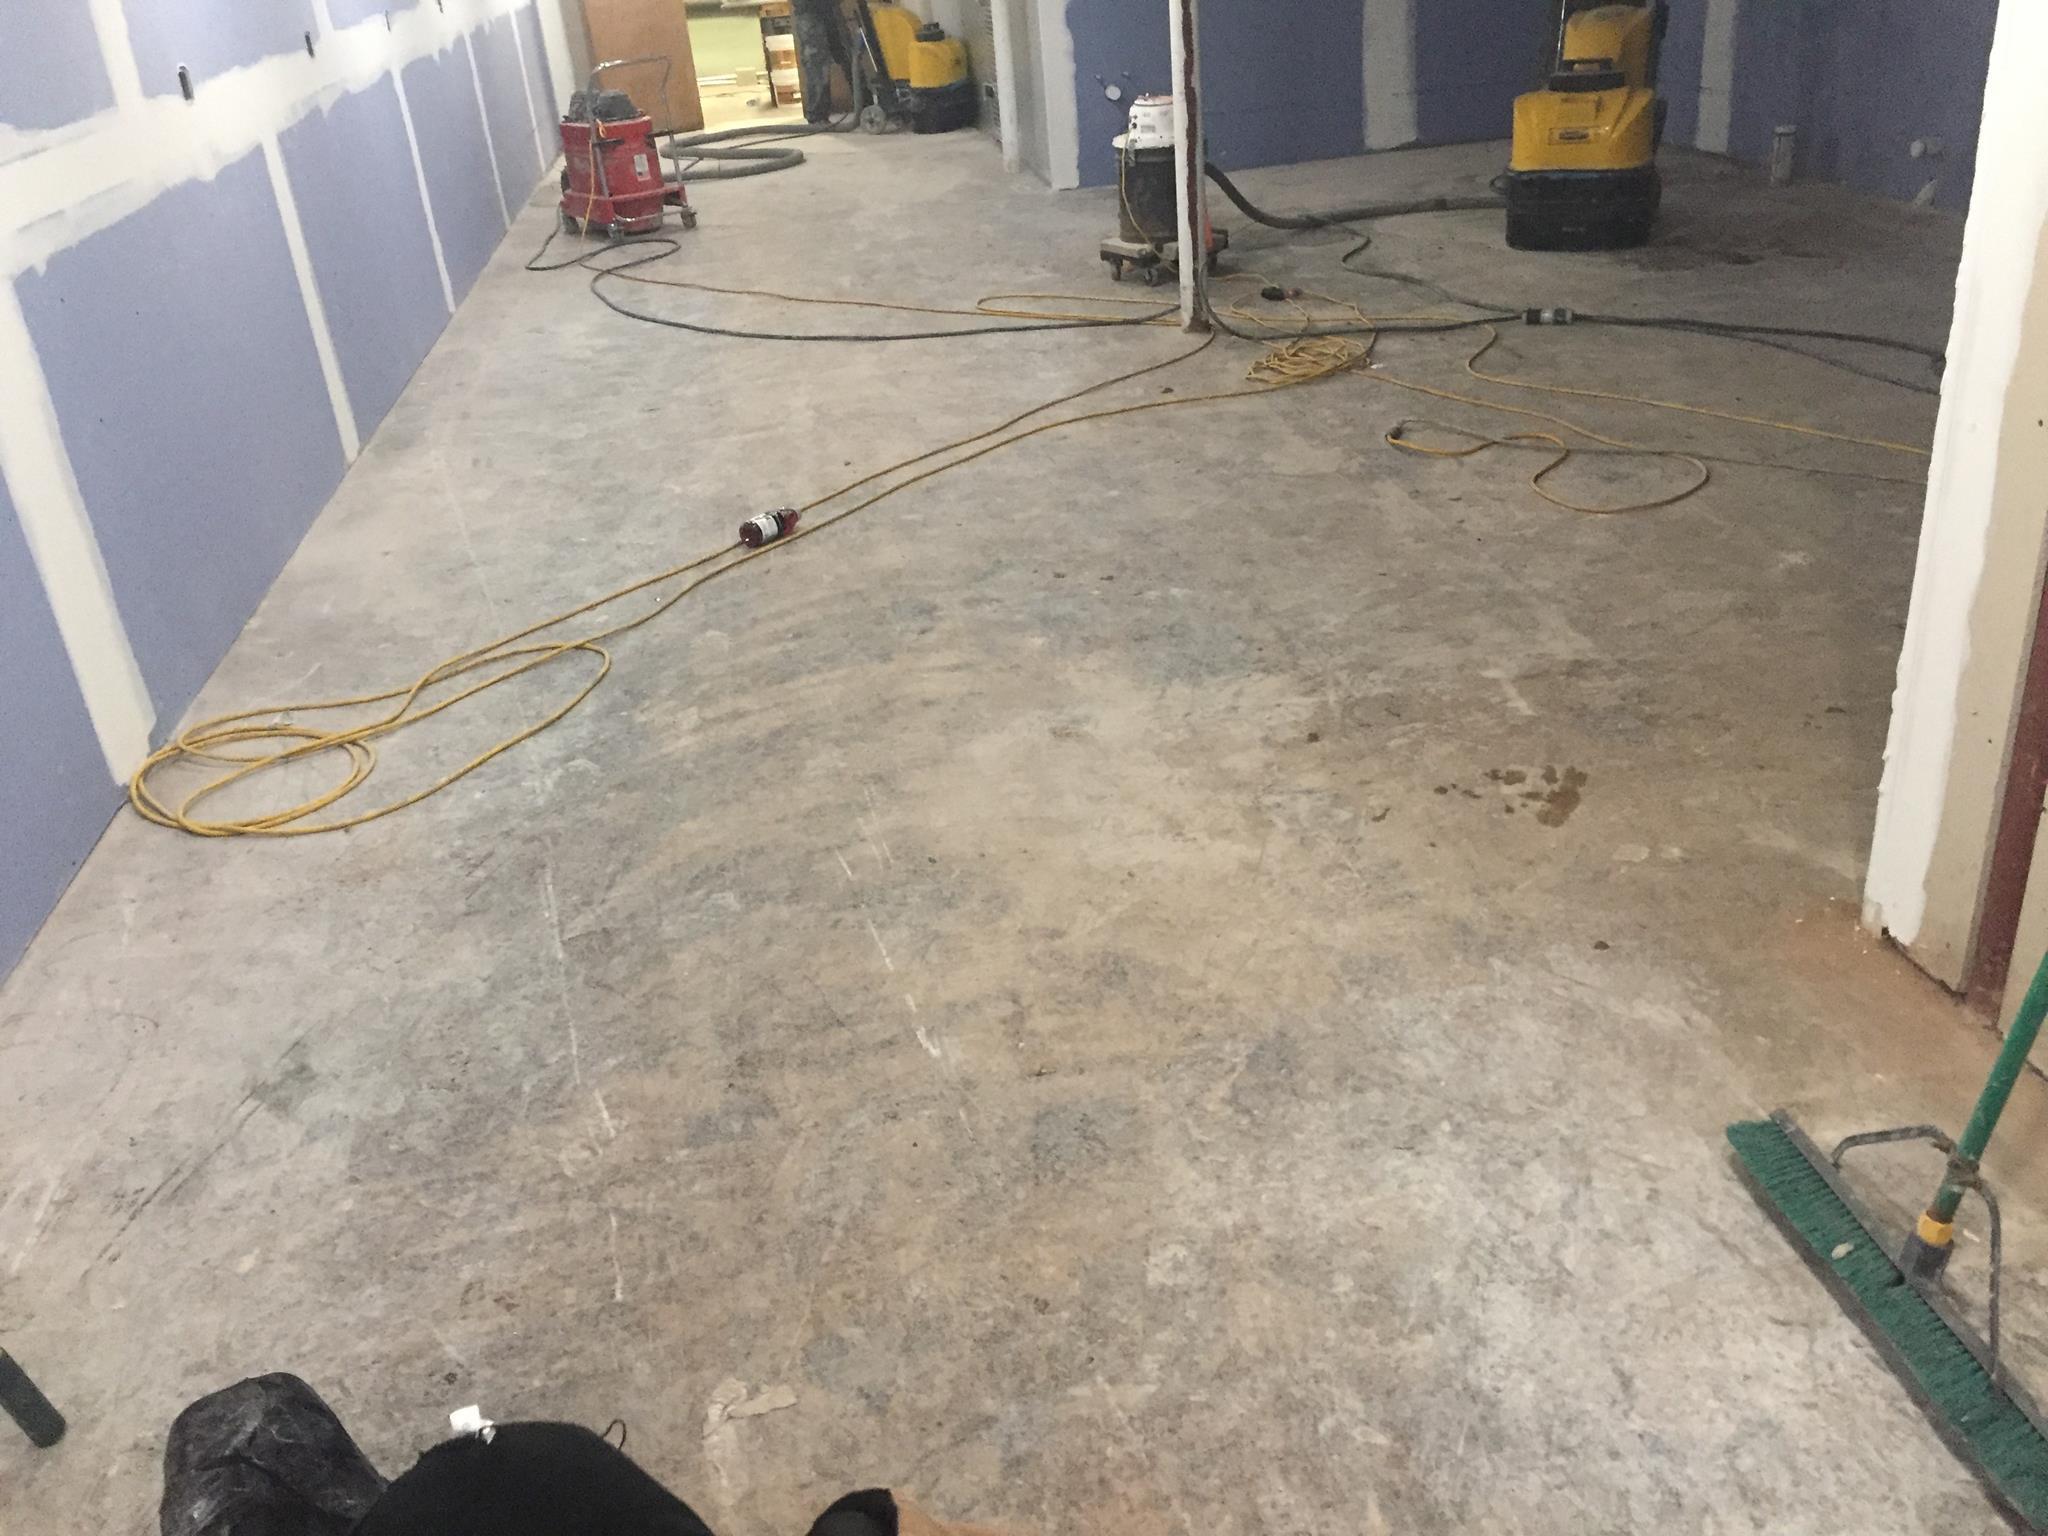 commercial kitchen epoxy floor middletown ct commercial kitchen flooring polycrete broadcast urethane cement Kitchen Floor Before